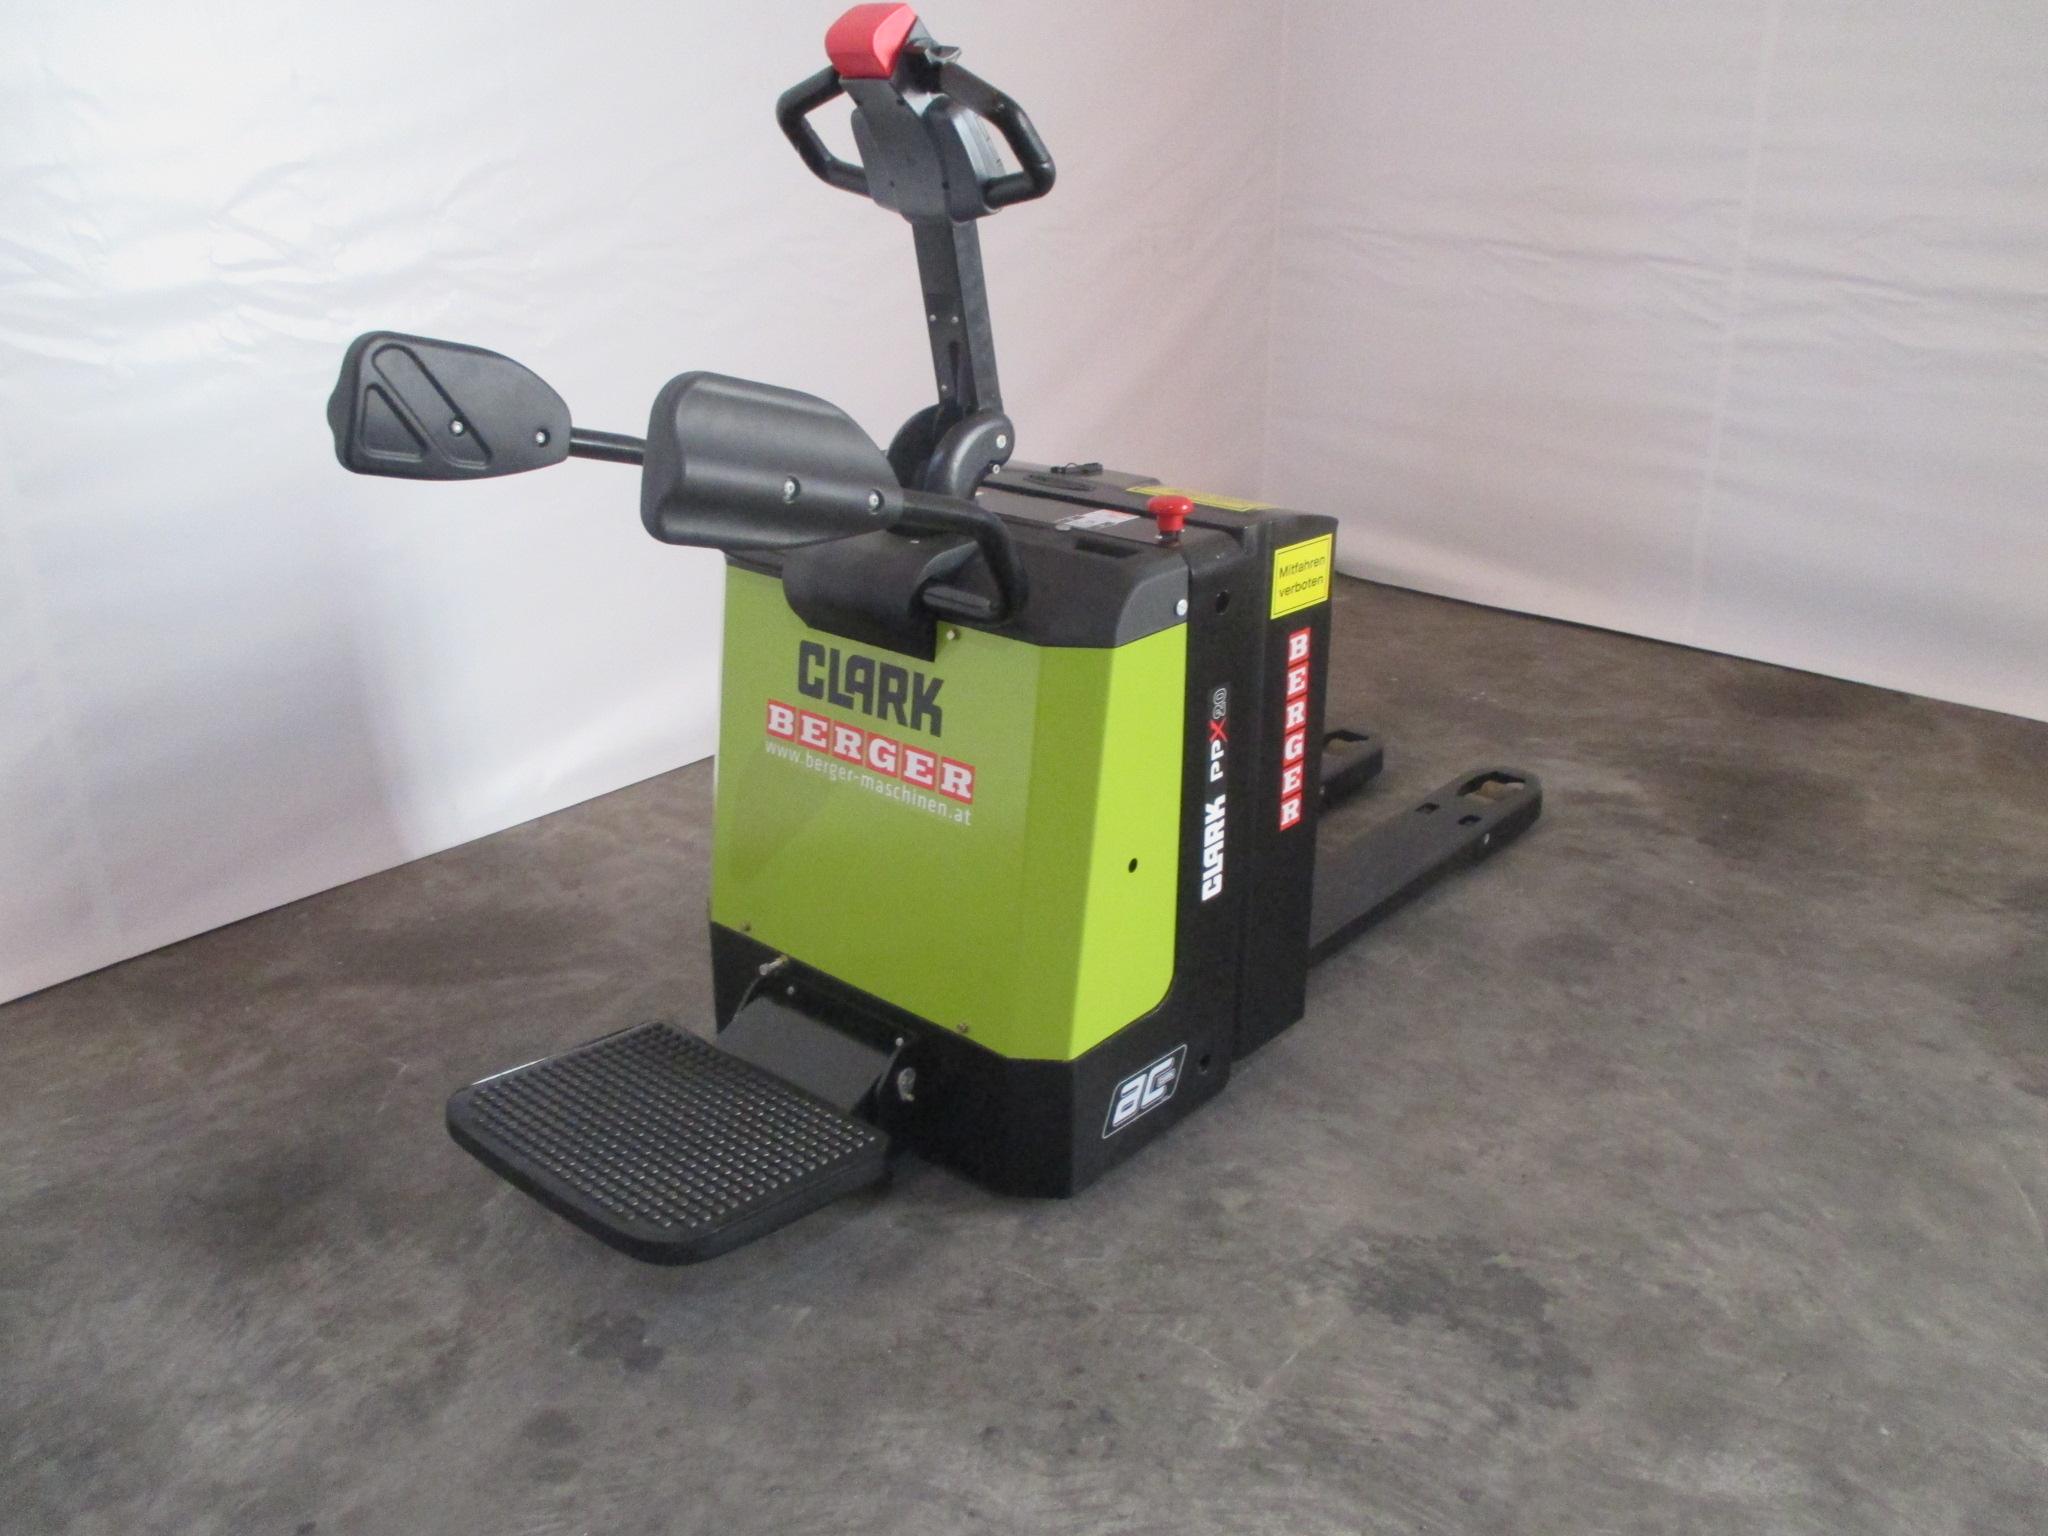 clark ppx 20 elektro hubwagen gabelstapler gebraucht. Black Bedroom Furniture Sets. Home Design Ideas